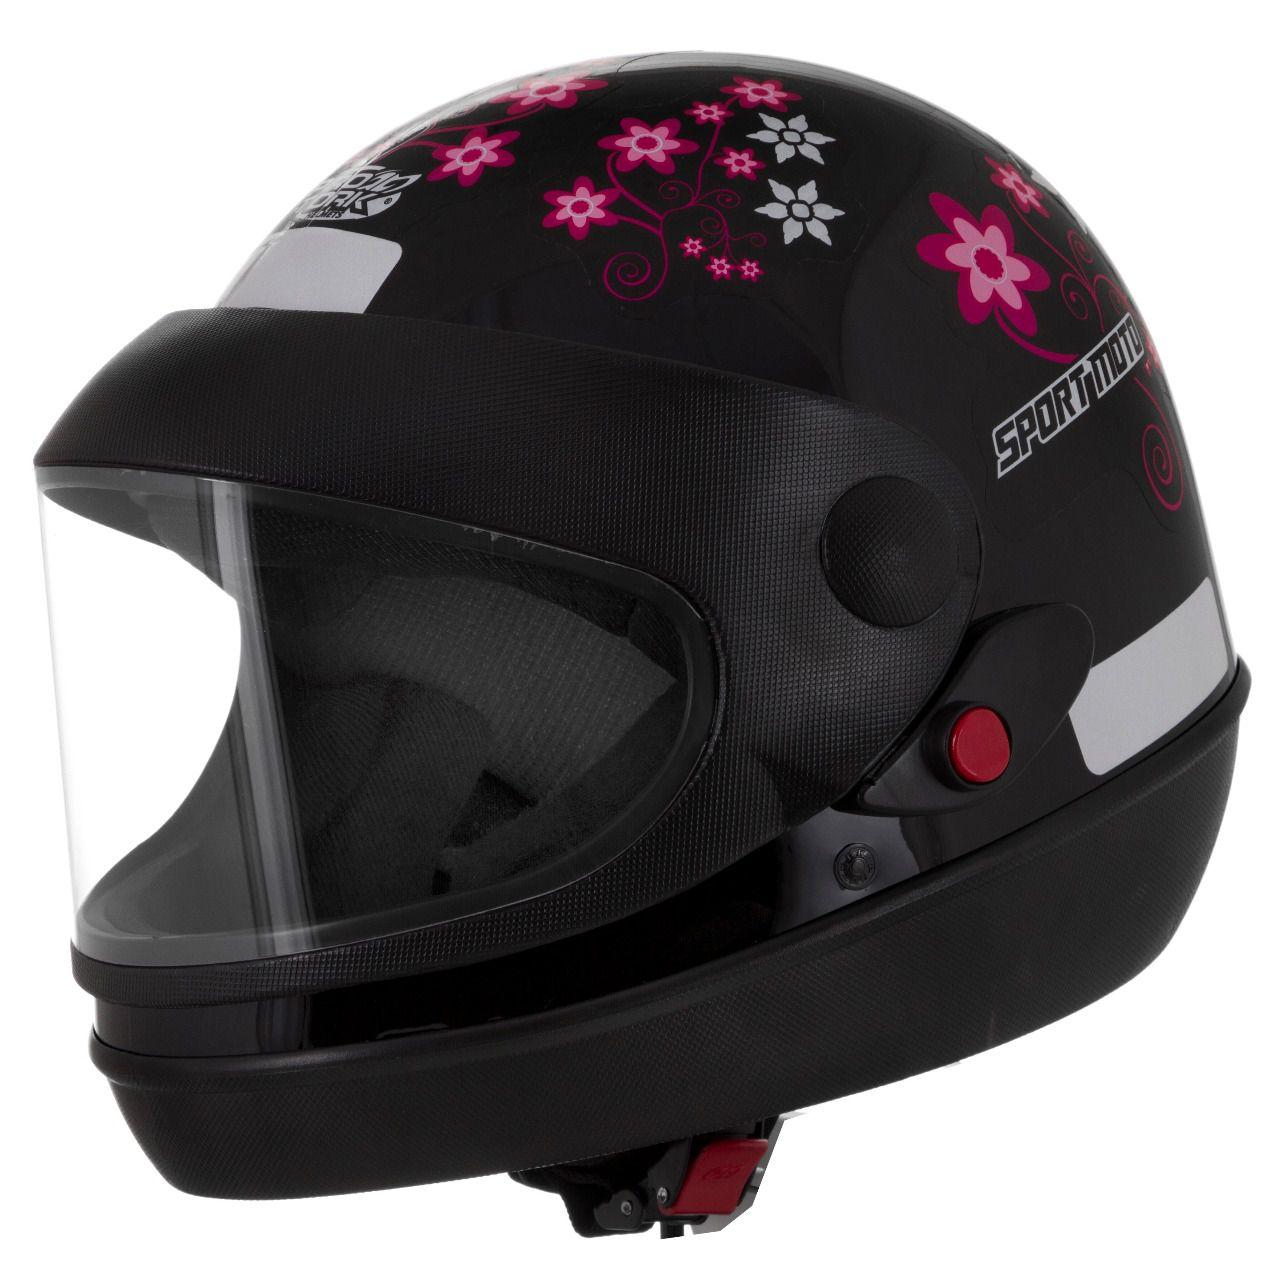 Capacete Feminino De Moto Sport Moto Preto For Girls